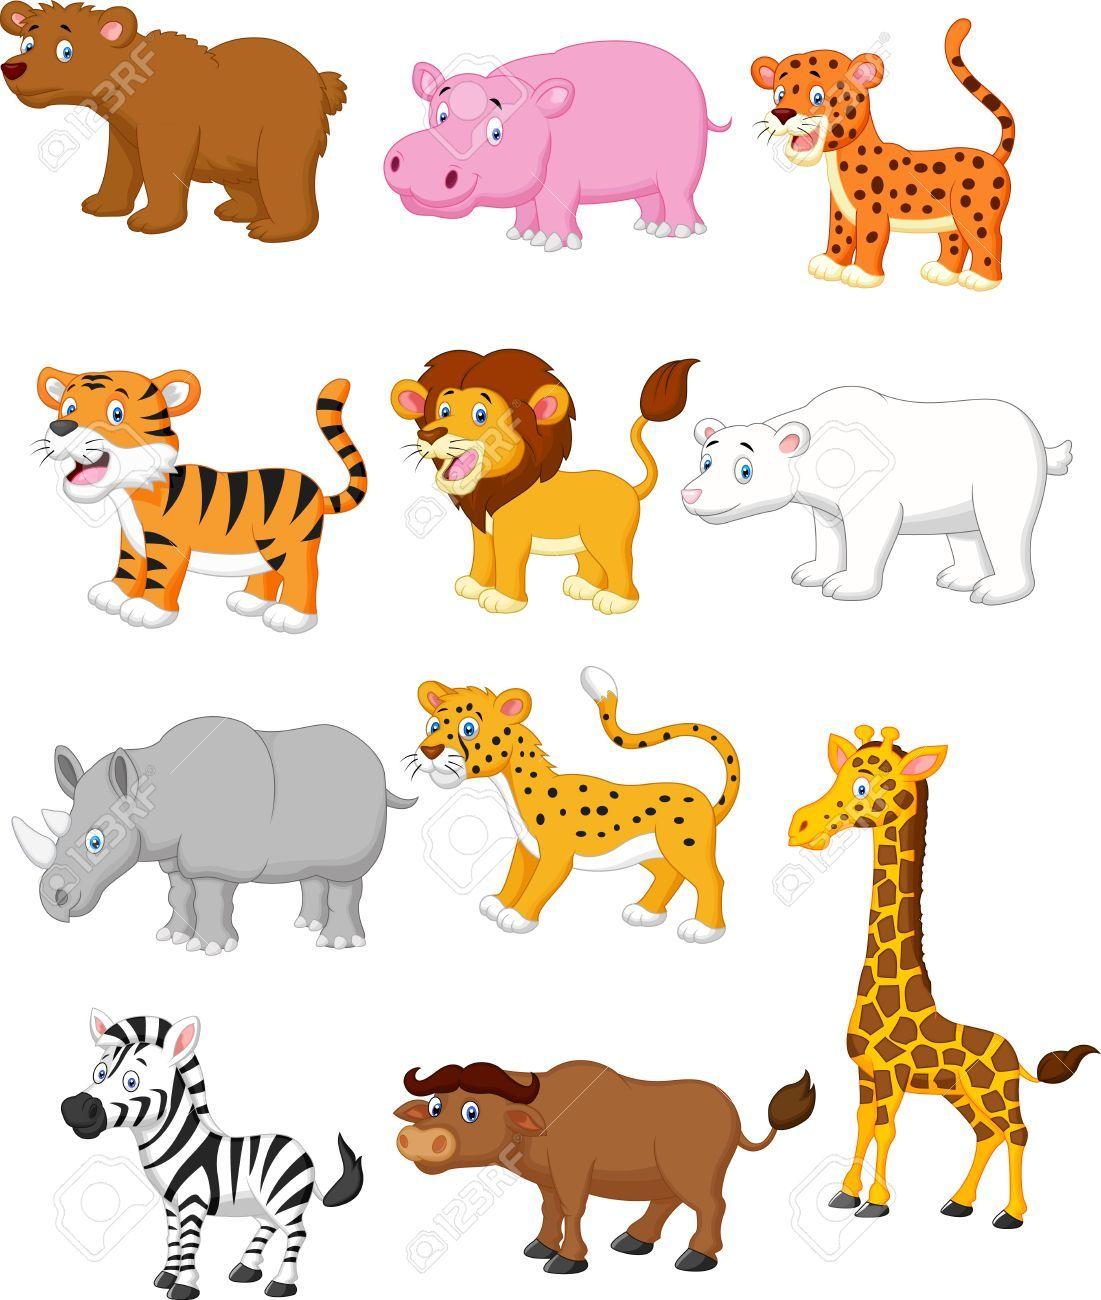 Wild Animal Cartoon Illustration Affiliate Animal Wild Illustration Cartoon Hewan Binatang Kartun